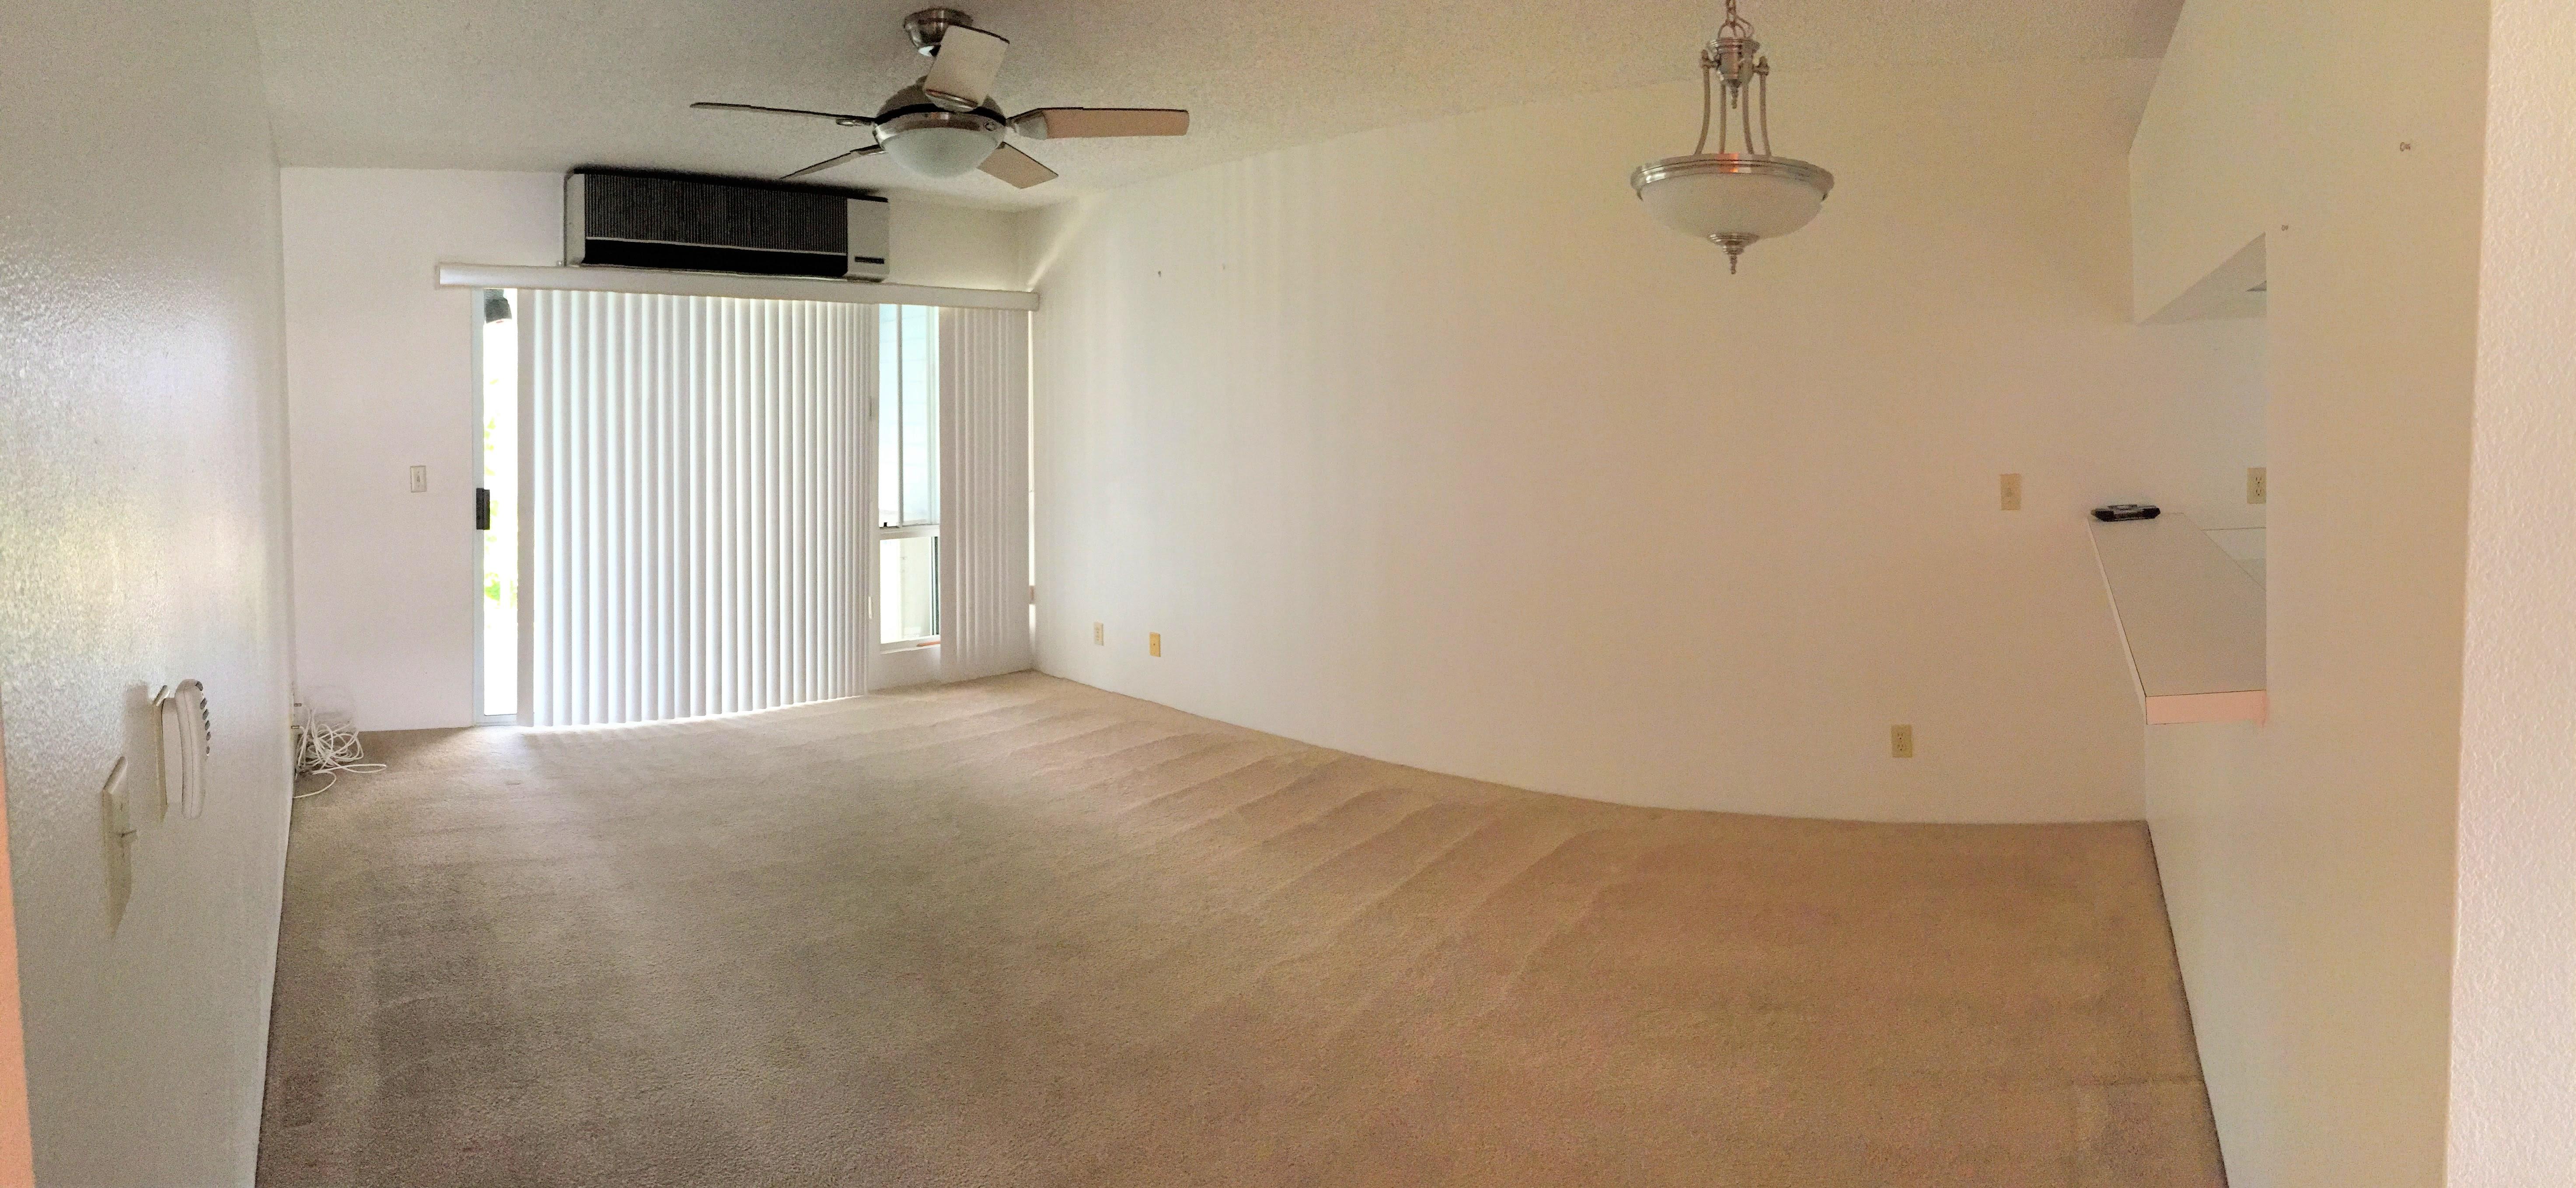 Living Room at 94-970 Lumiauau Street #J202 Waipahu